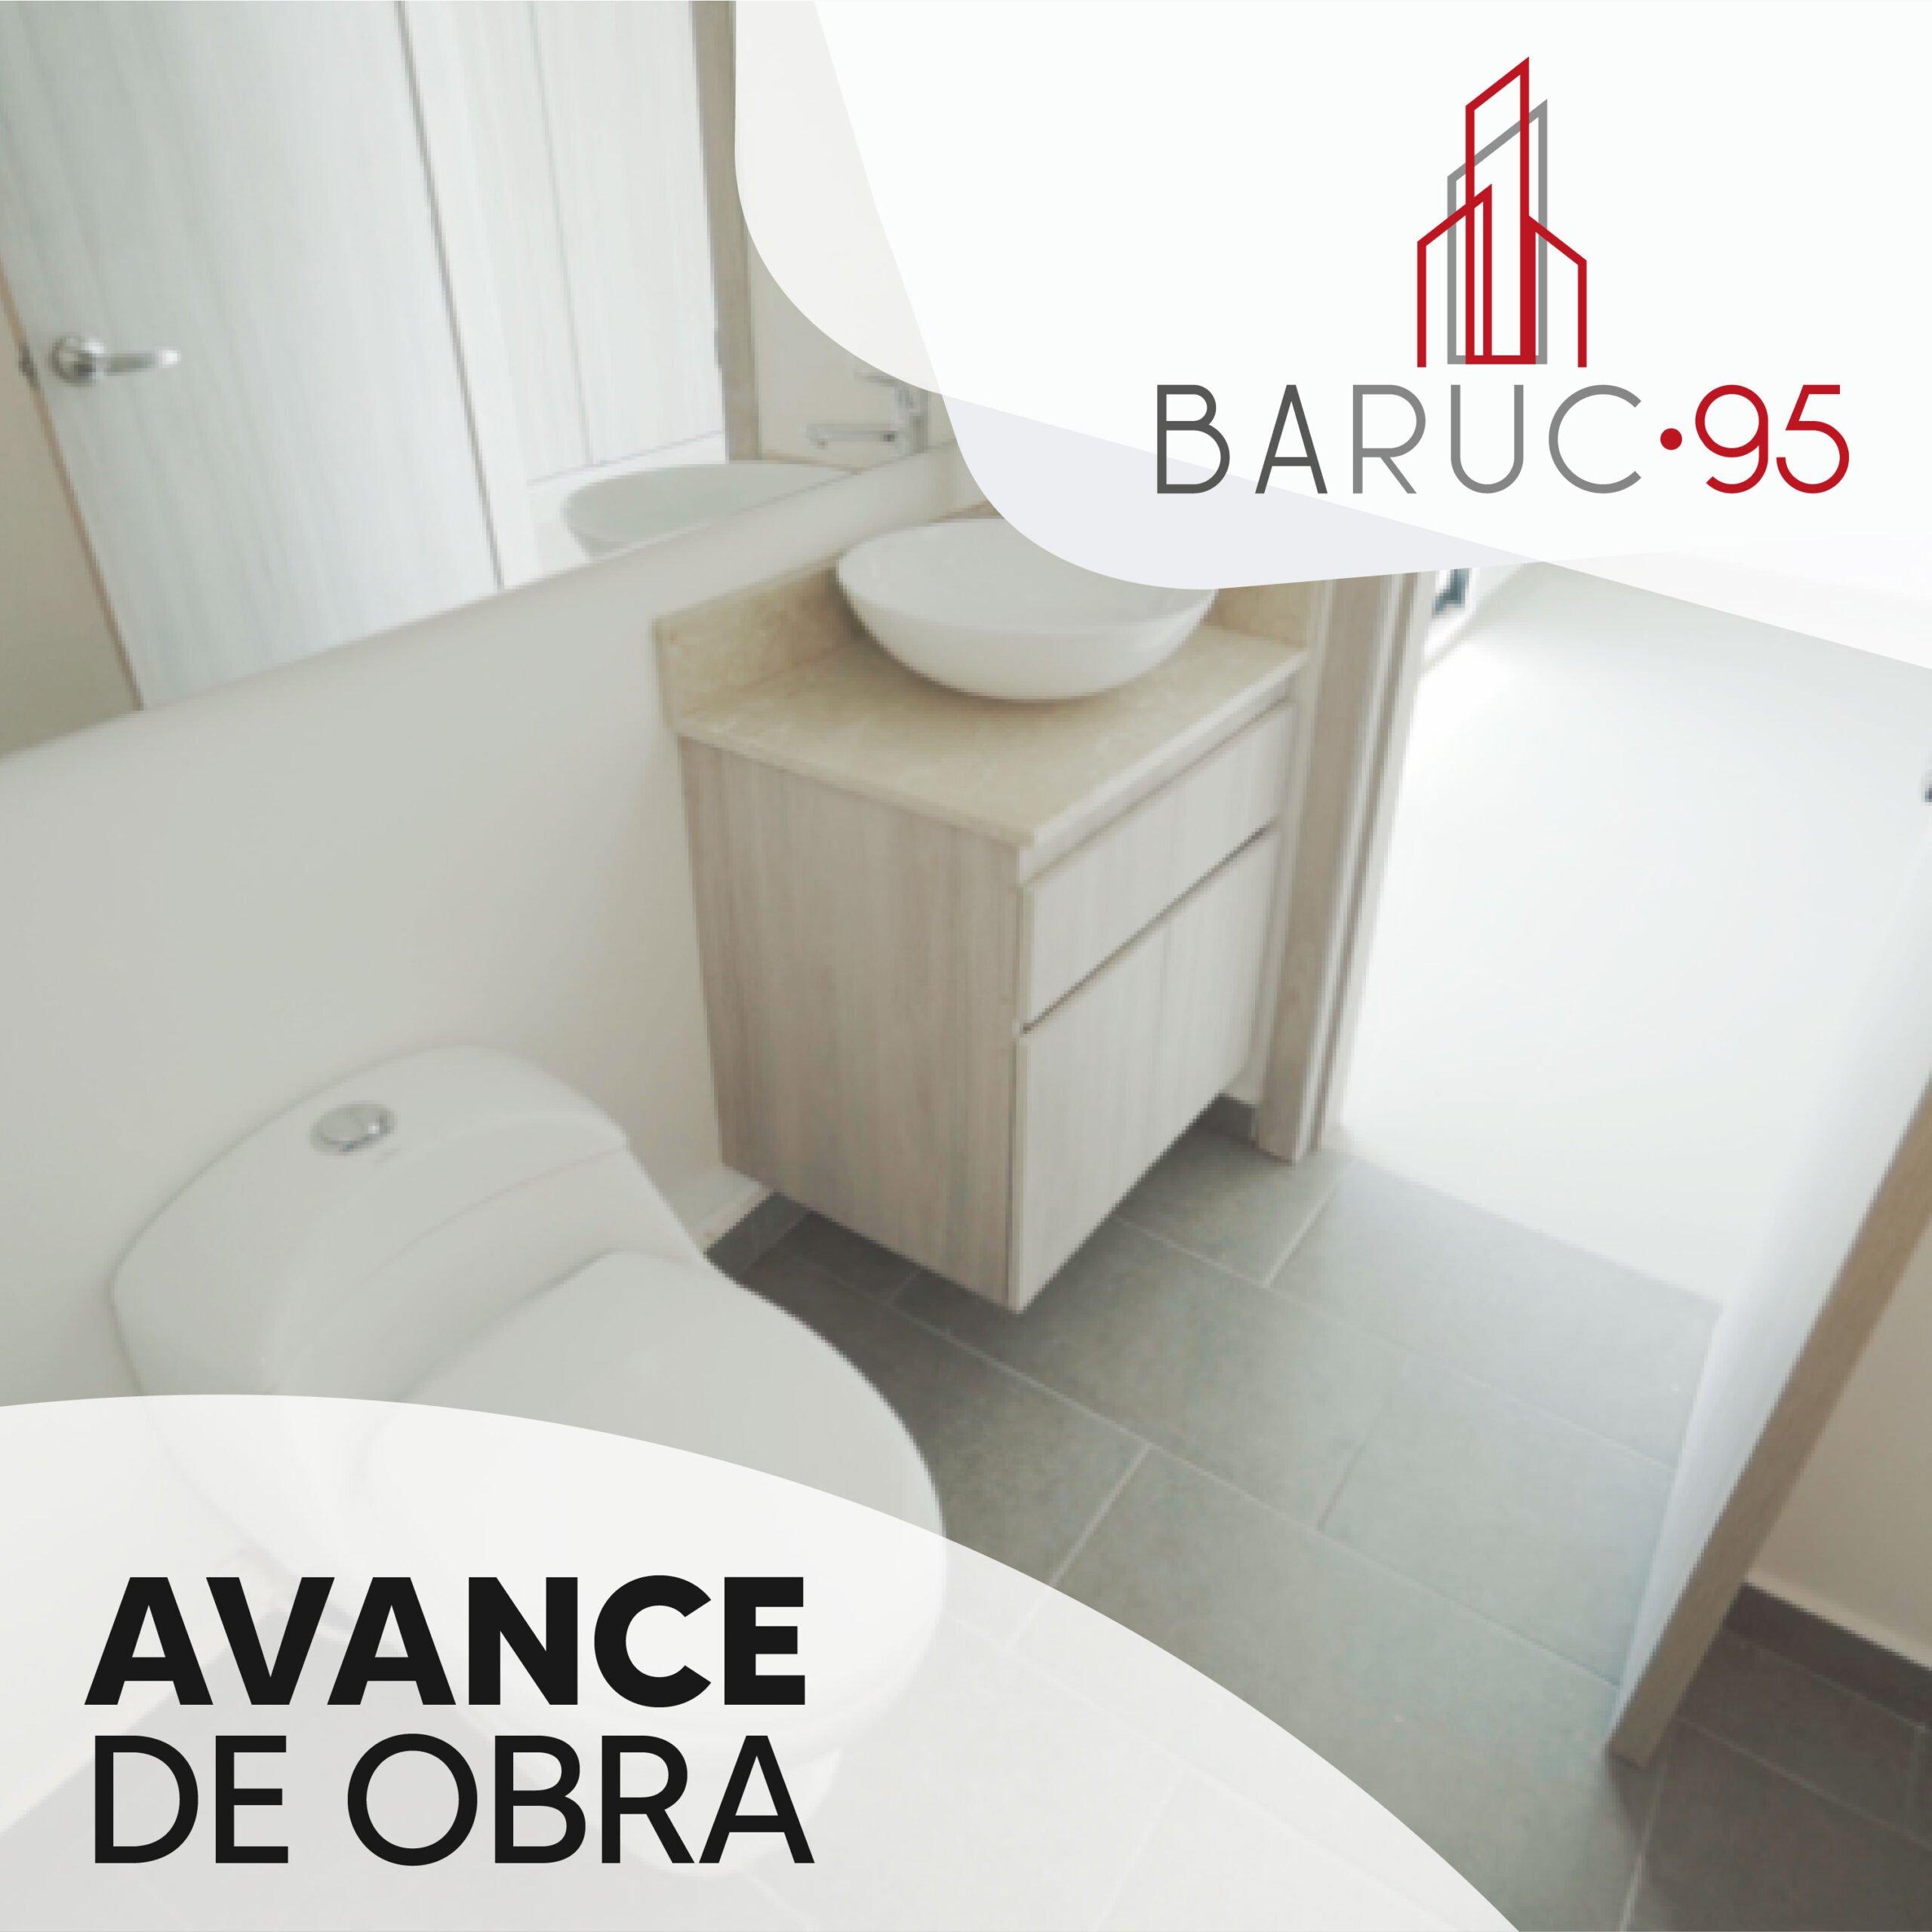 Baruc 95 avance de obras